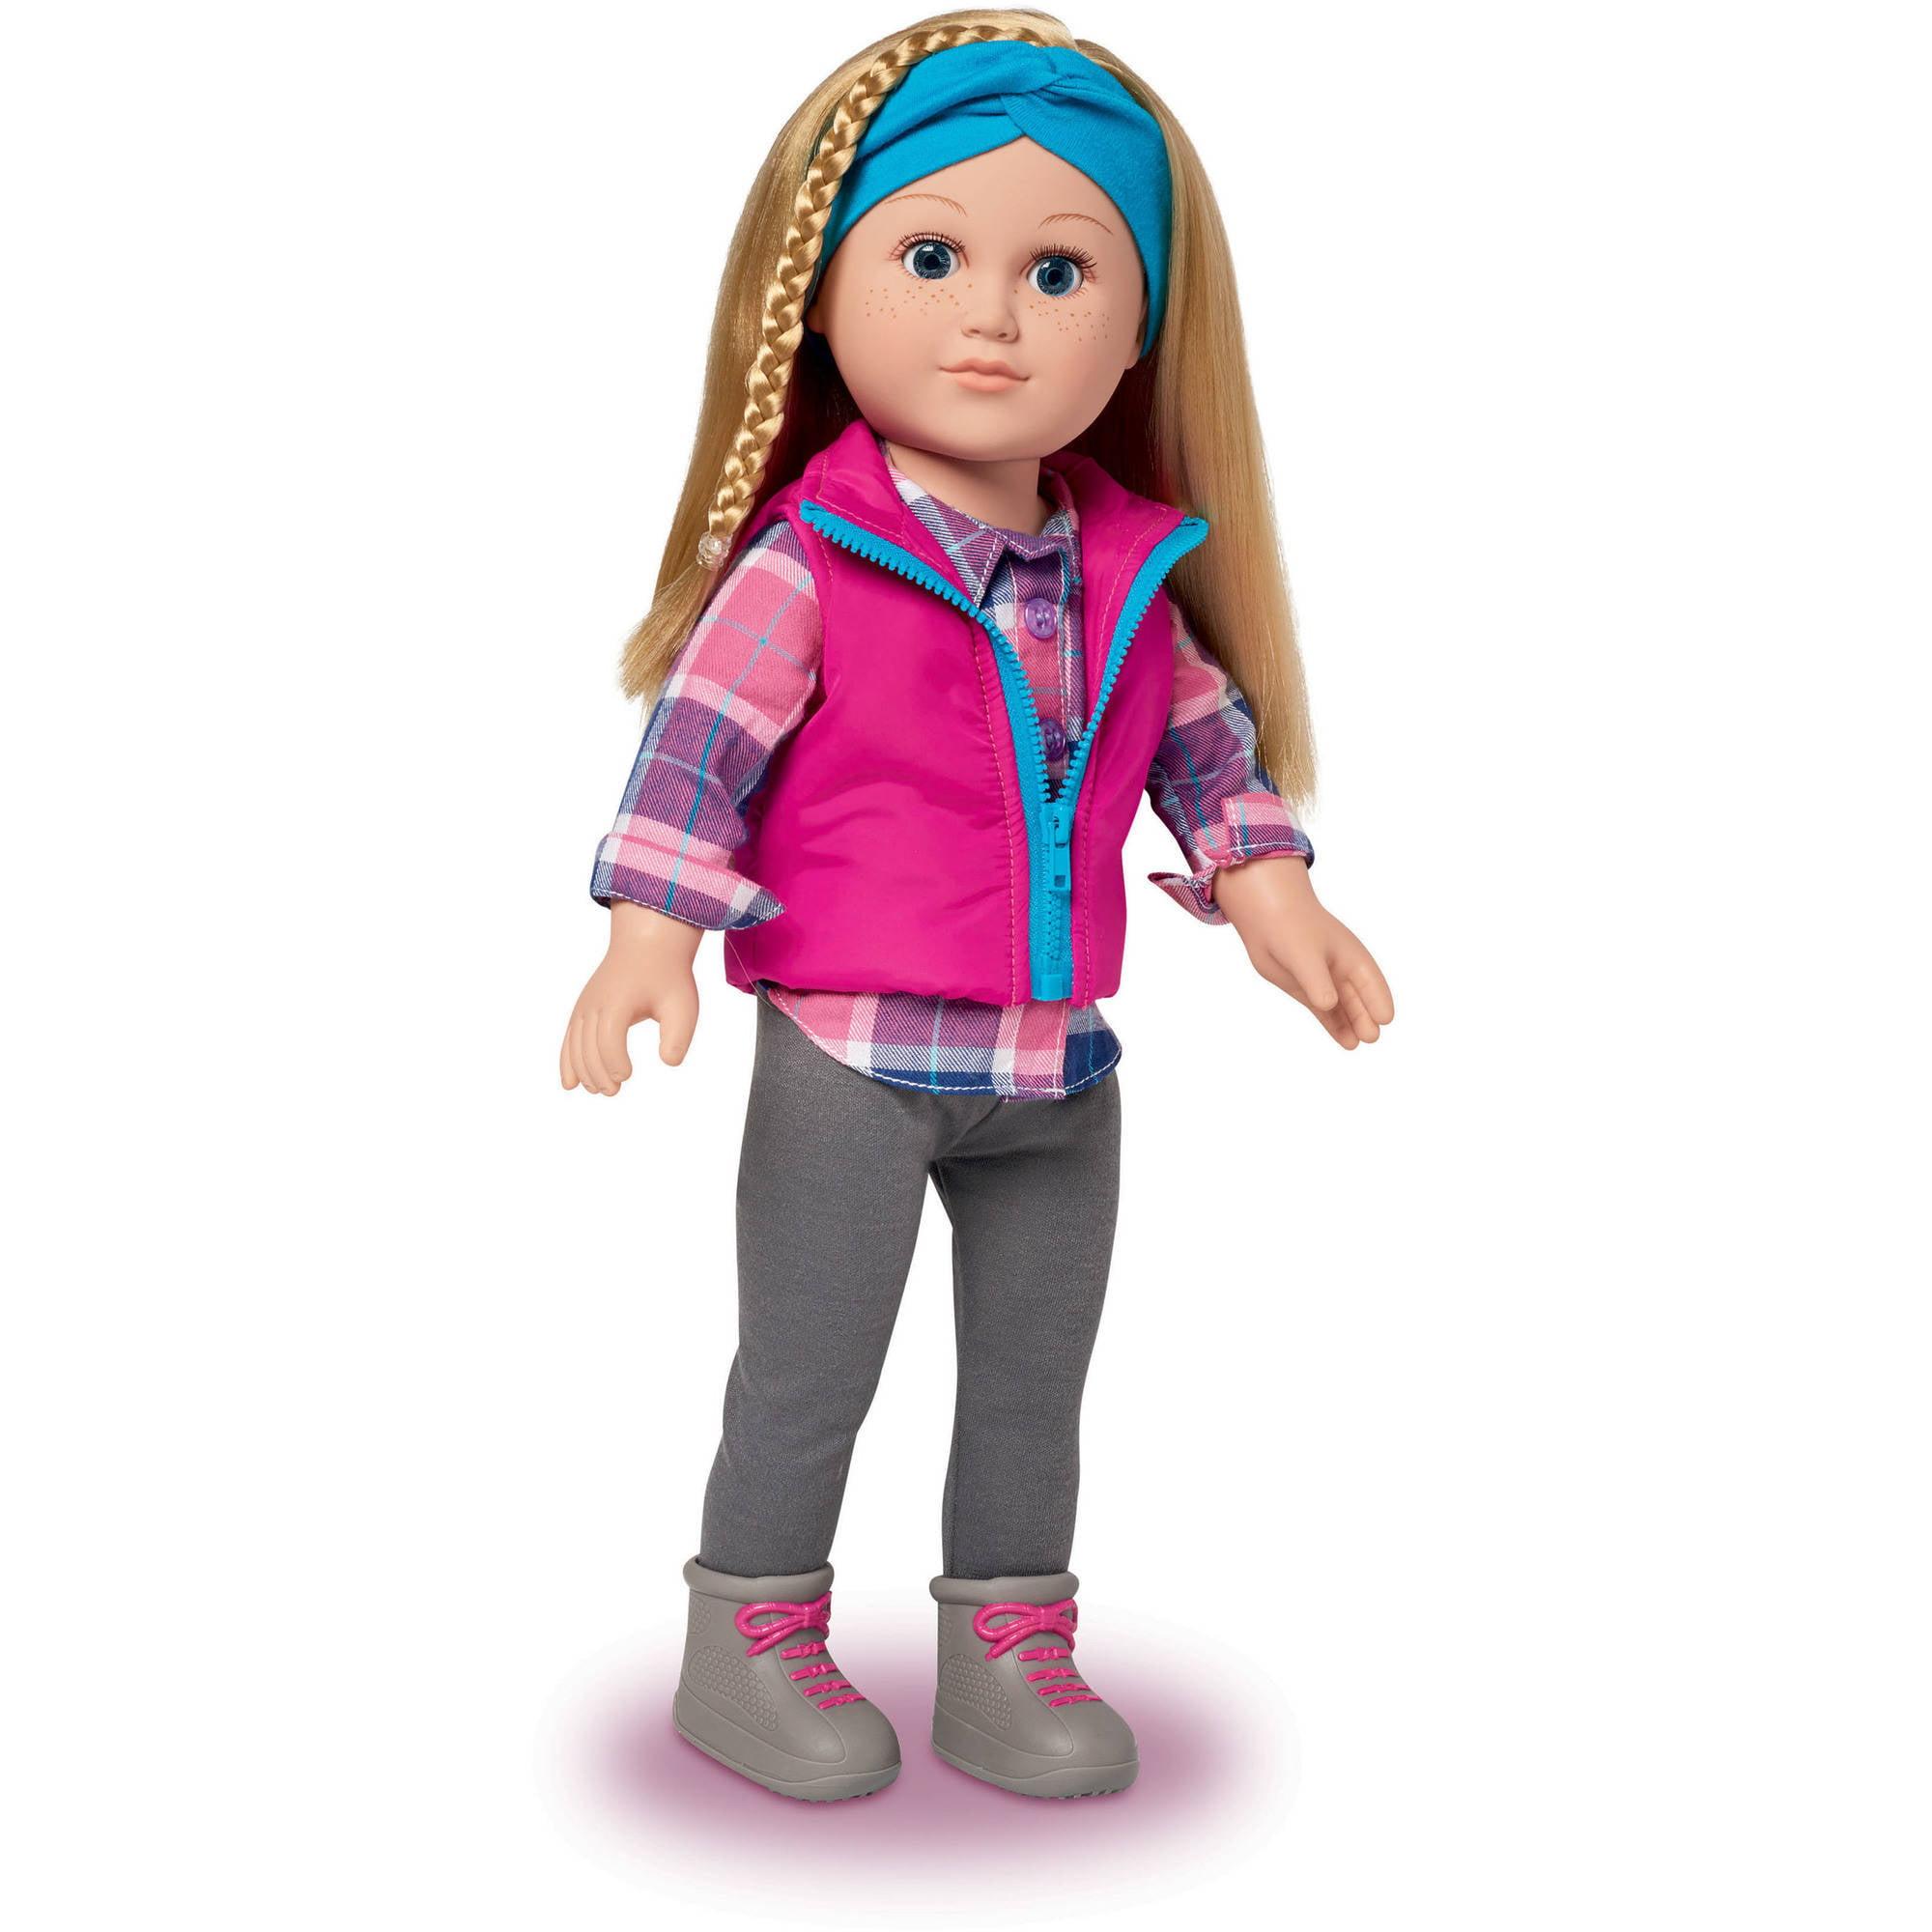 My Life as™ Outdoorsy Girl Doll Walmart